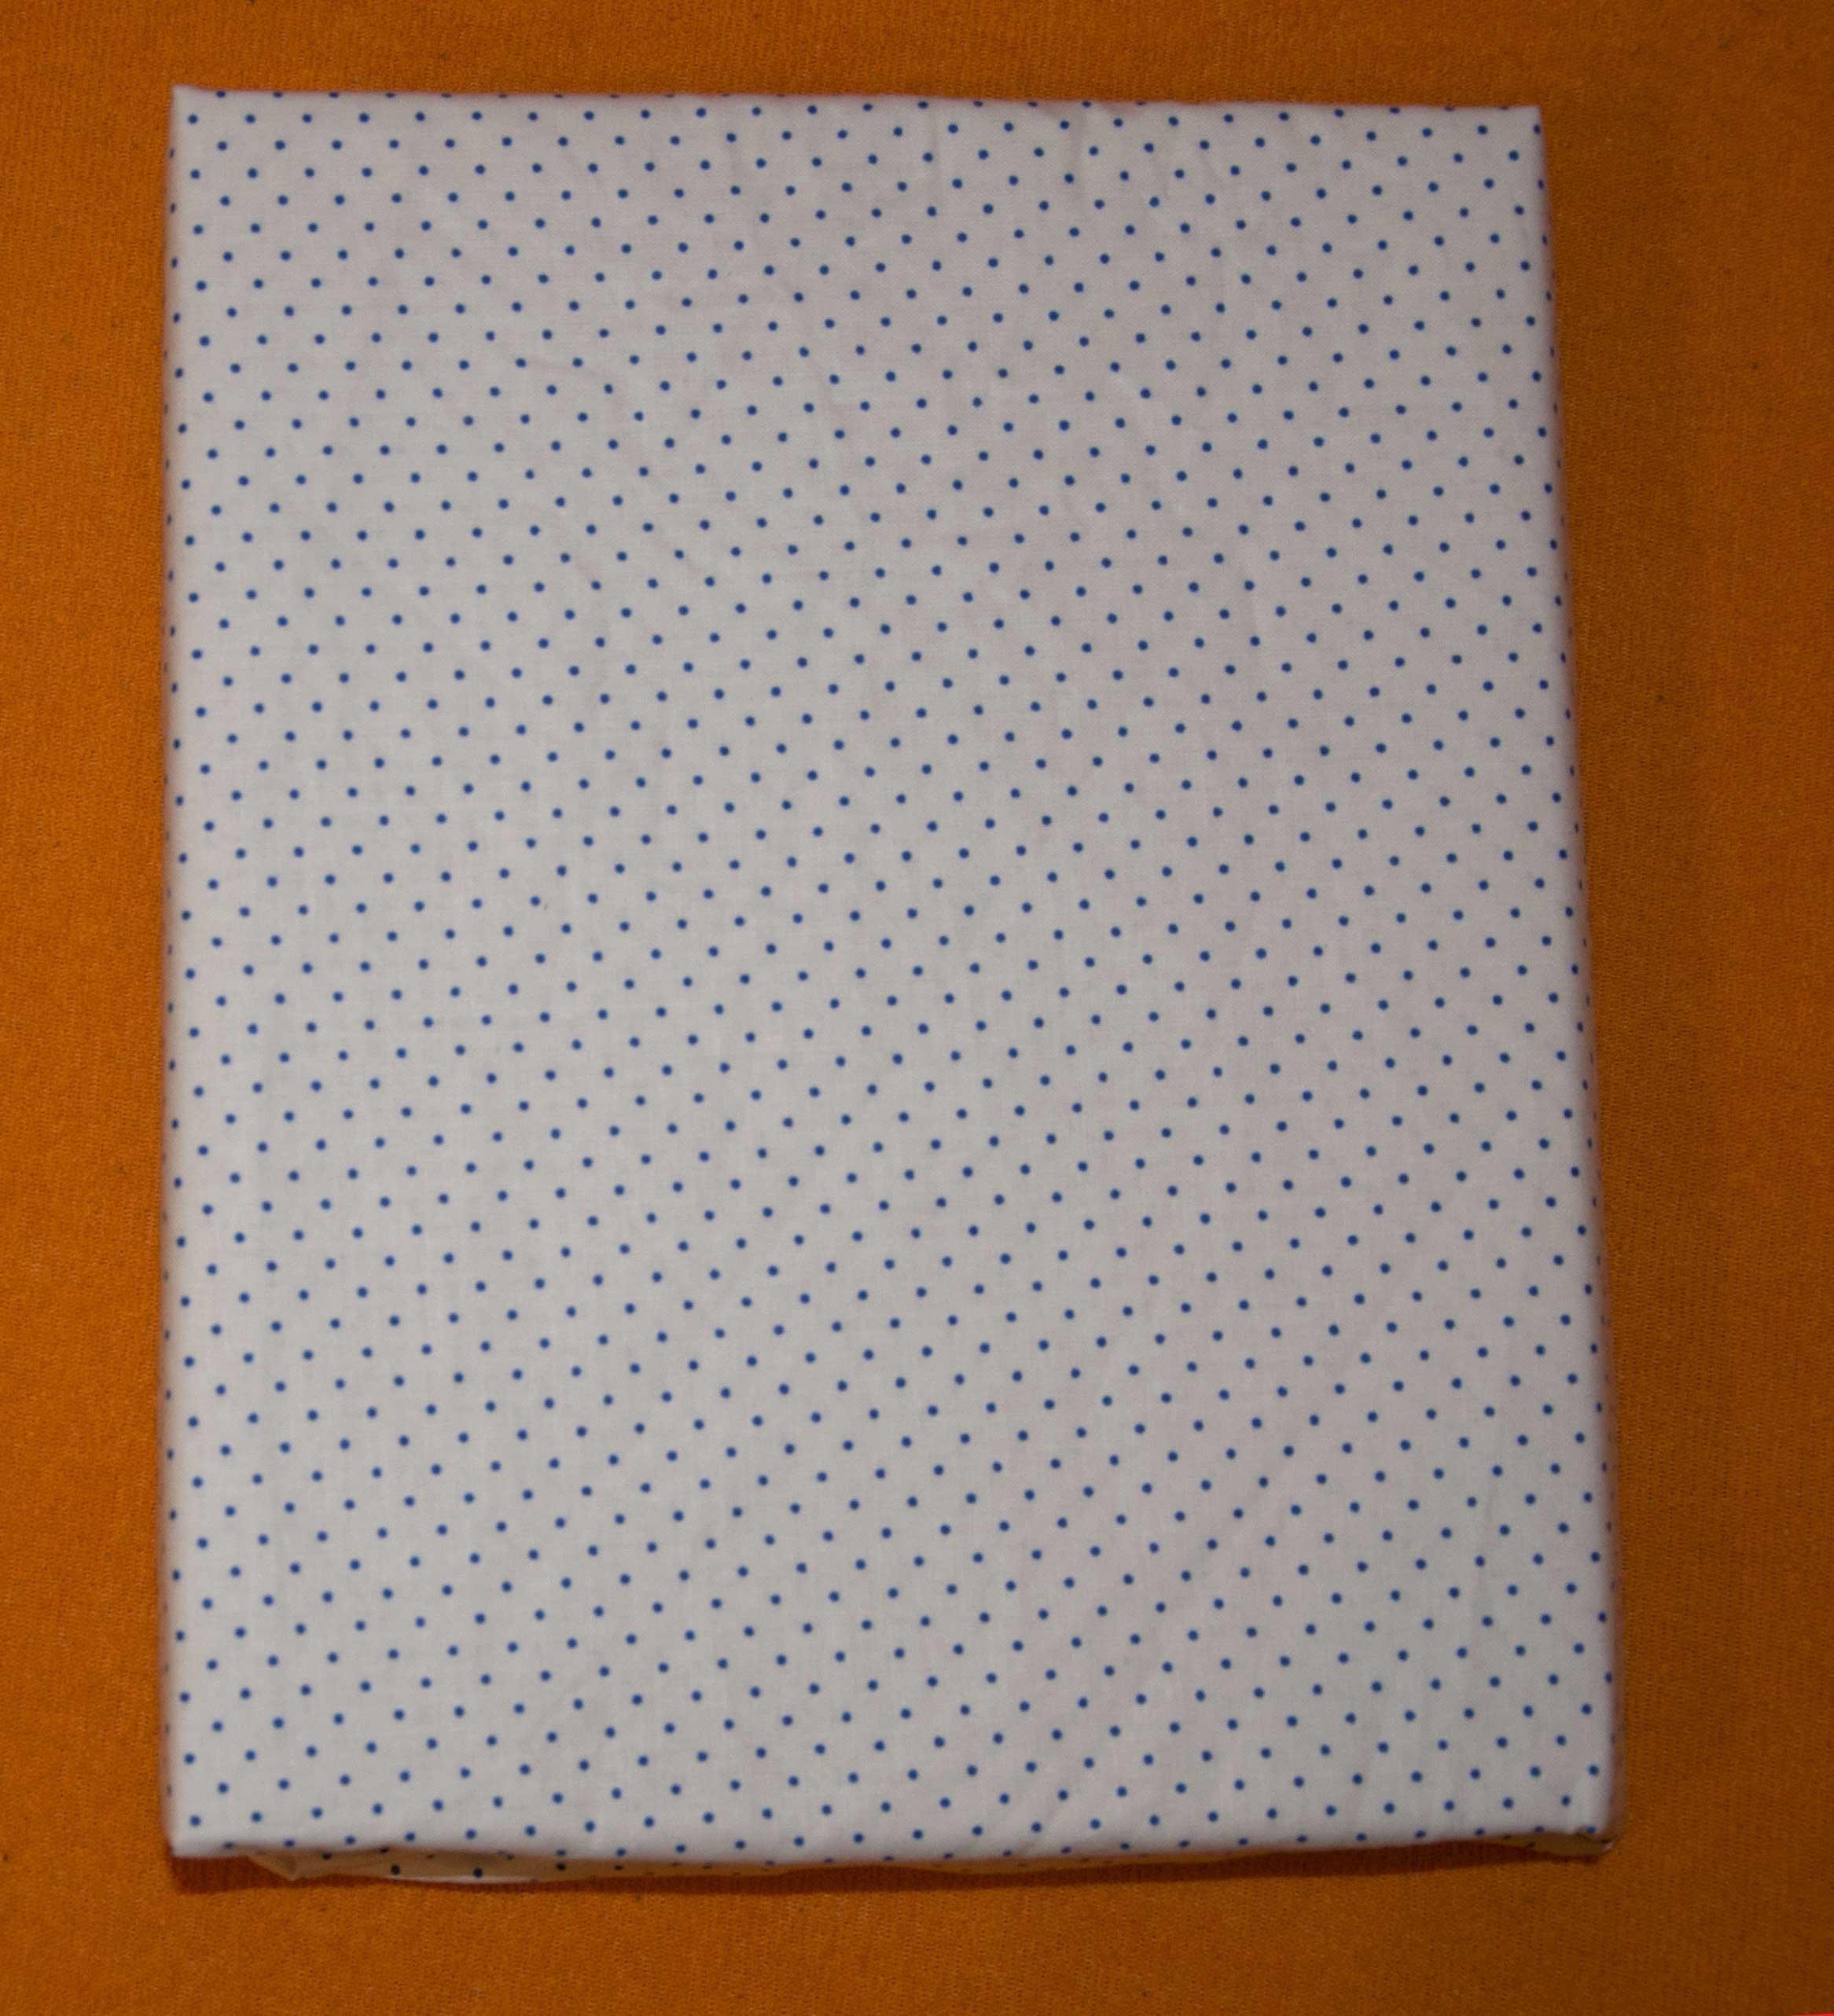 Bavln�n� prost�radlo 120x60 cm b�l� s modr�mi men��mi punt�ky